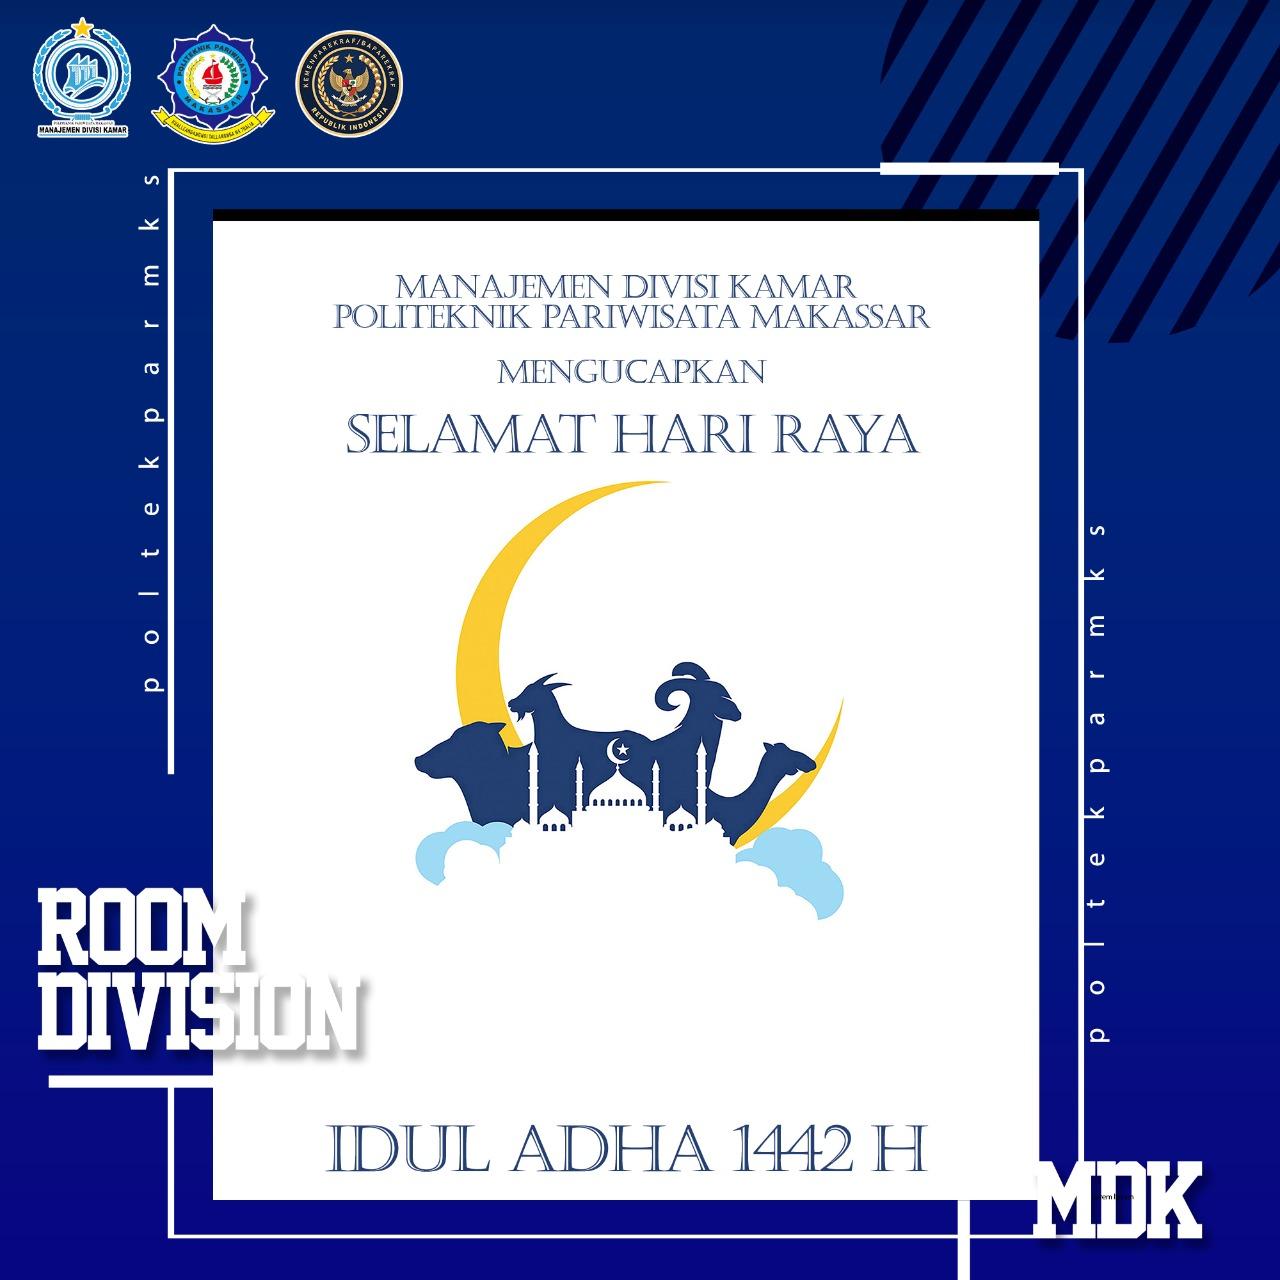 SELAMAT HARI RAYA IDUL ADHA 1442H